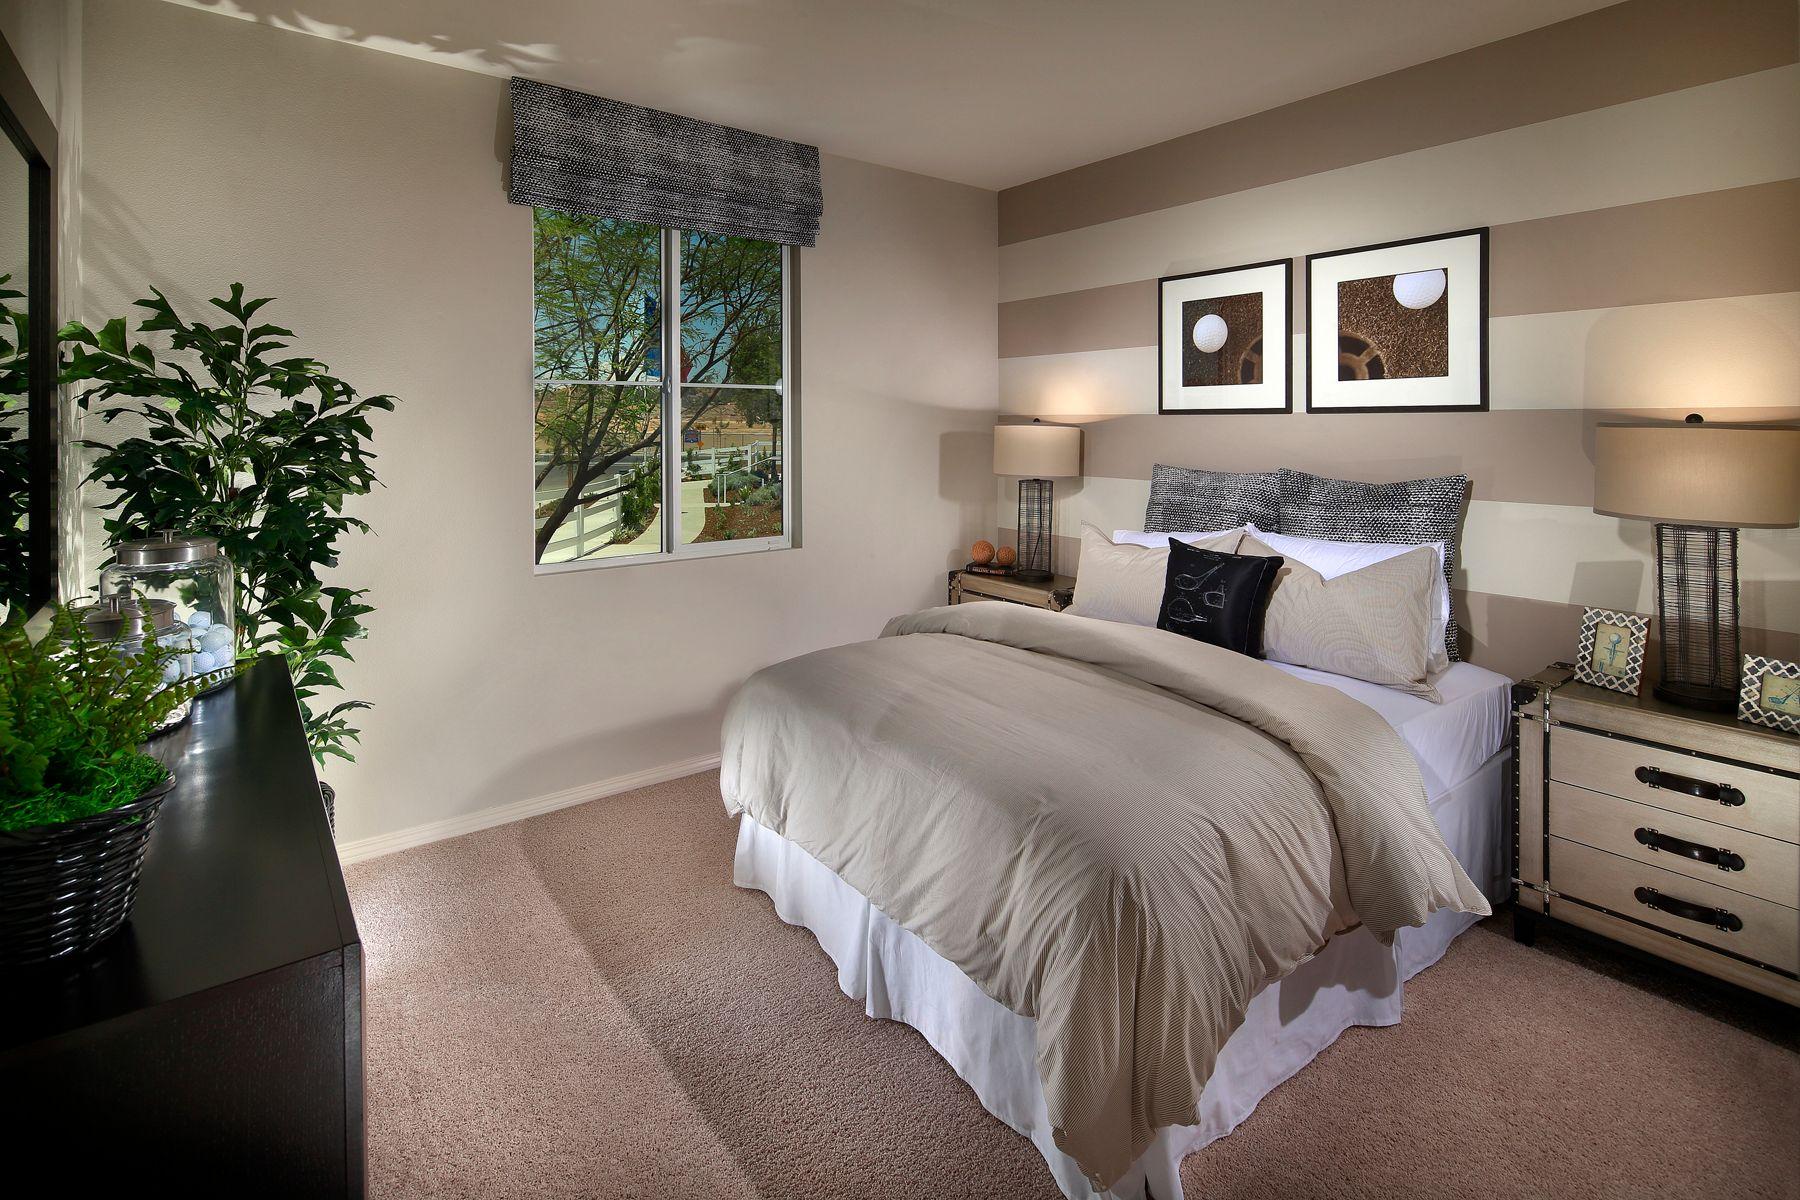 willow tree in menifee ca new homes floor plans by william lyon